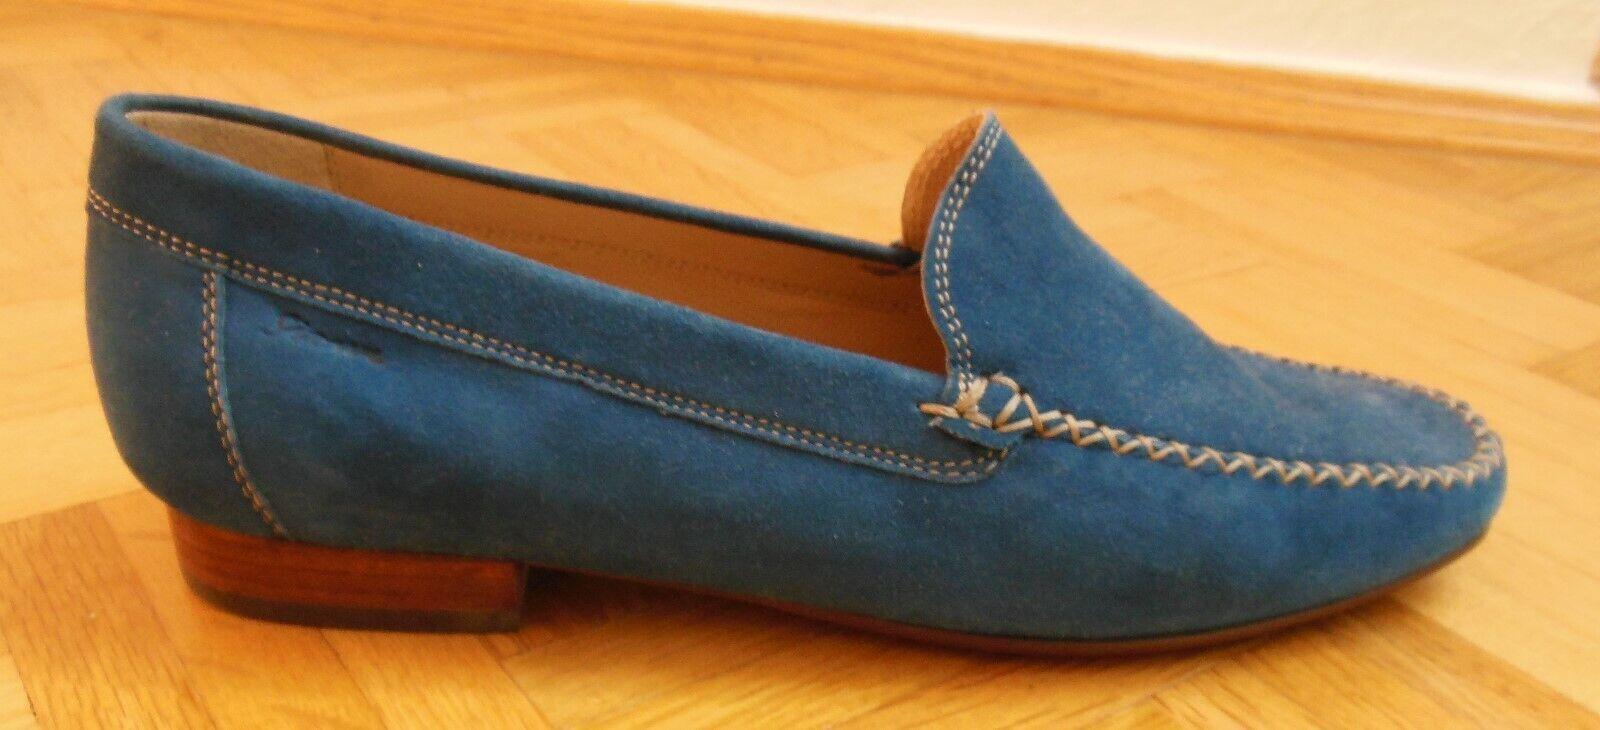 Blaue Damen Sioux Mokassin, Slipper, Gr. 40